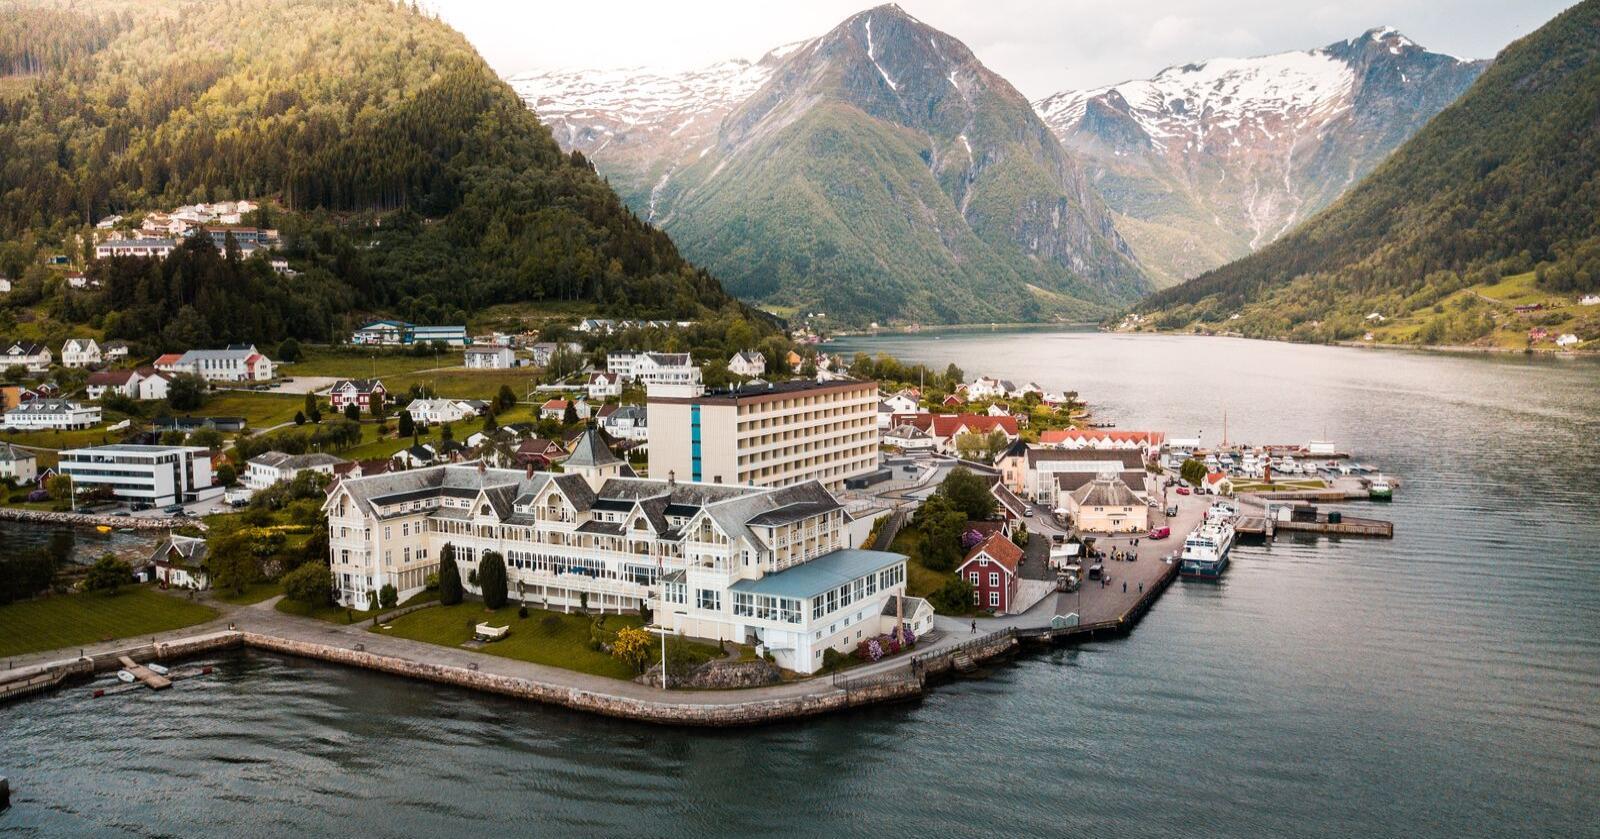 Kviknes Hotel i Balestrand førebur seg no på ta i mot nordmenn i sommar. Foto: Kviknes Hotel